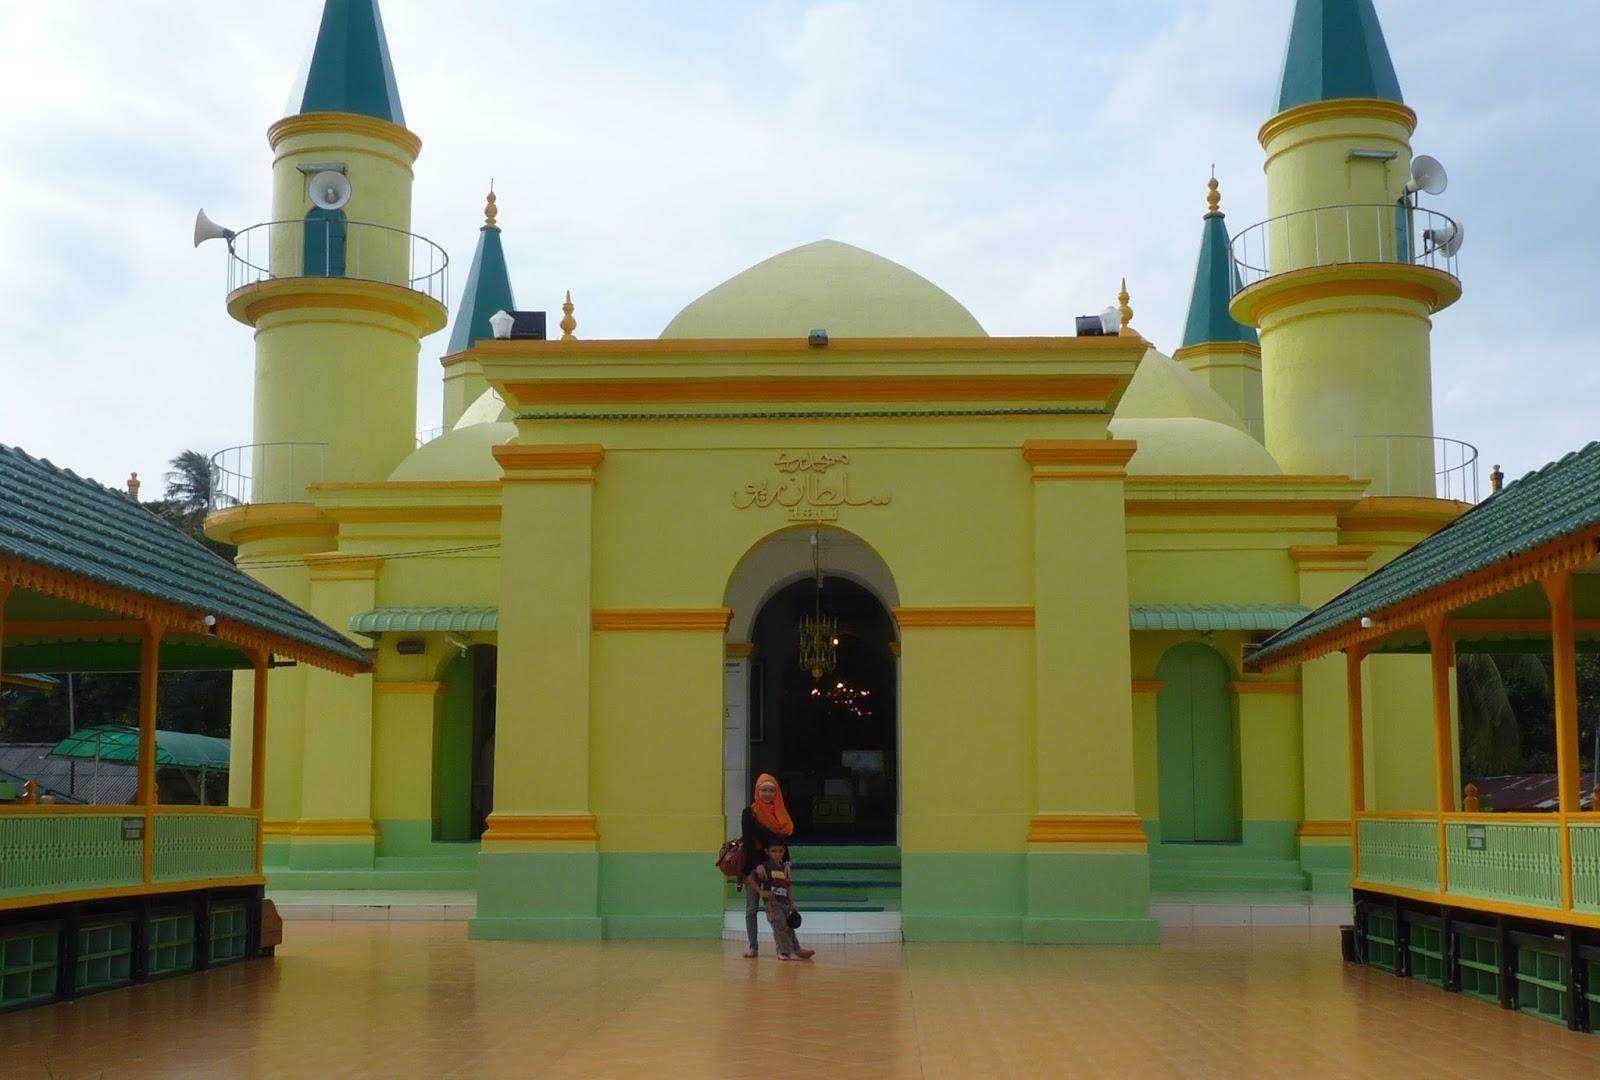 Eksotisme Tempat Wisata Pulau Penyengat Kepulauan Riau Jelajah Masjid Raya